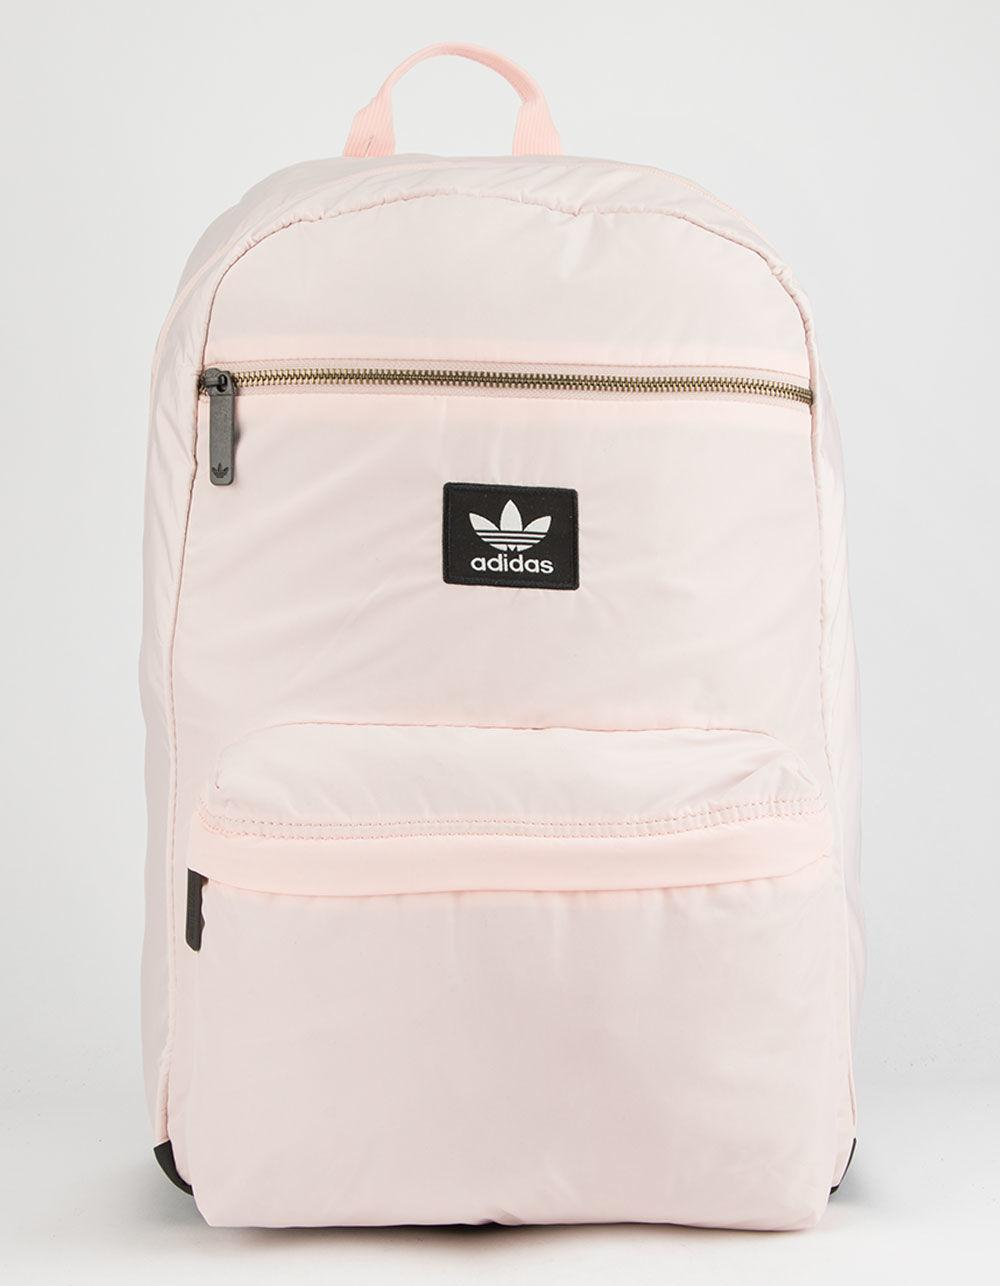 b1b17ad2cc Adidas - Originals National Plus Pink Backpack - Lyst. View fullscreen